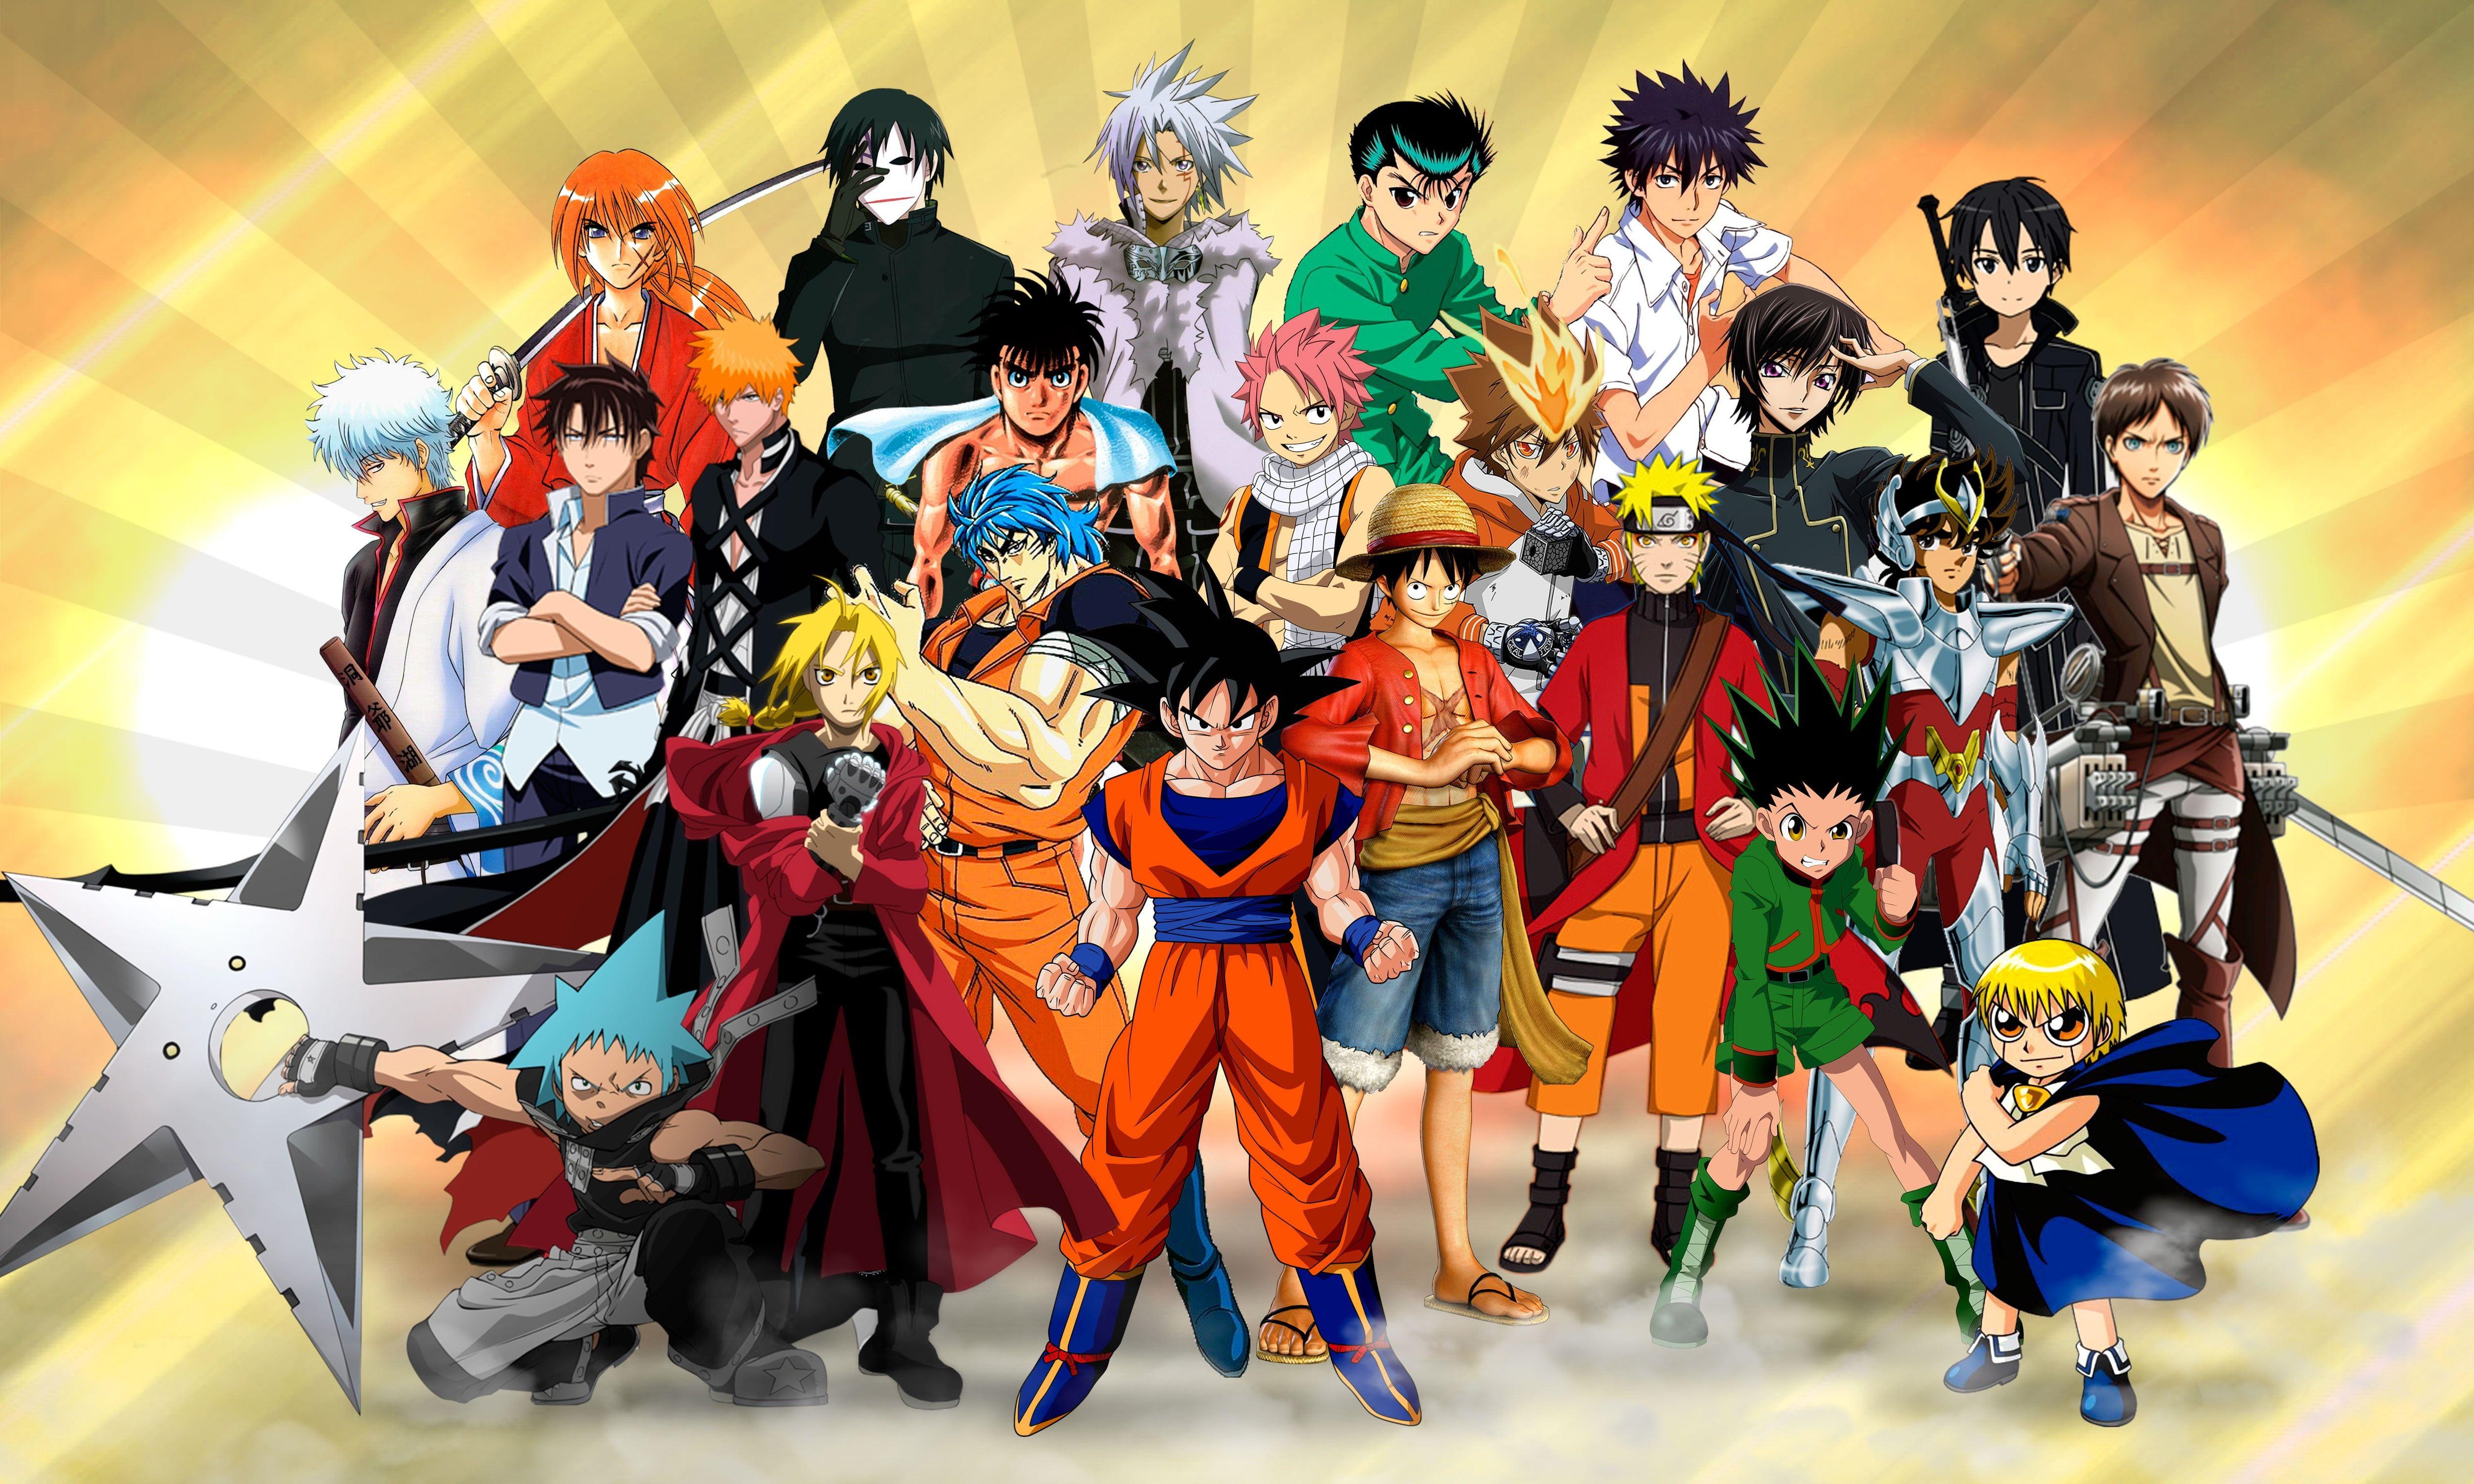 Assorted Anime Characters Illustration Anime Characters 3d Wallpaper Eren Jeager Hei Shingeki No Kyojin Son Goku Mon Anime Crossover Anime Anime Warrior Girl